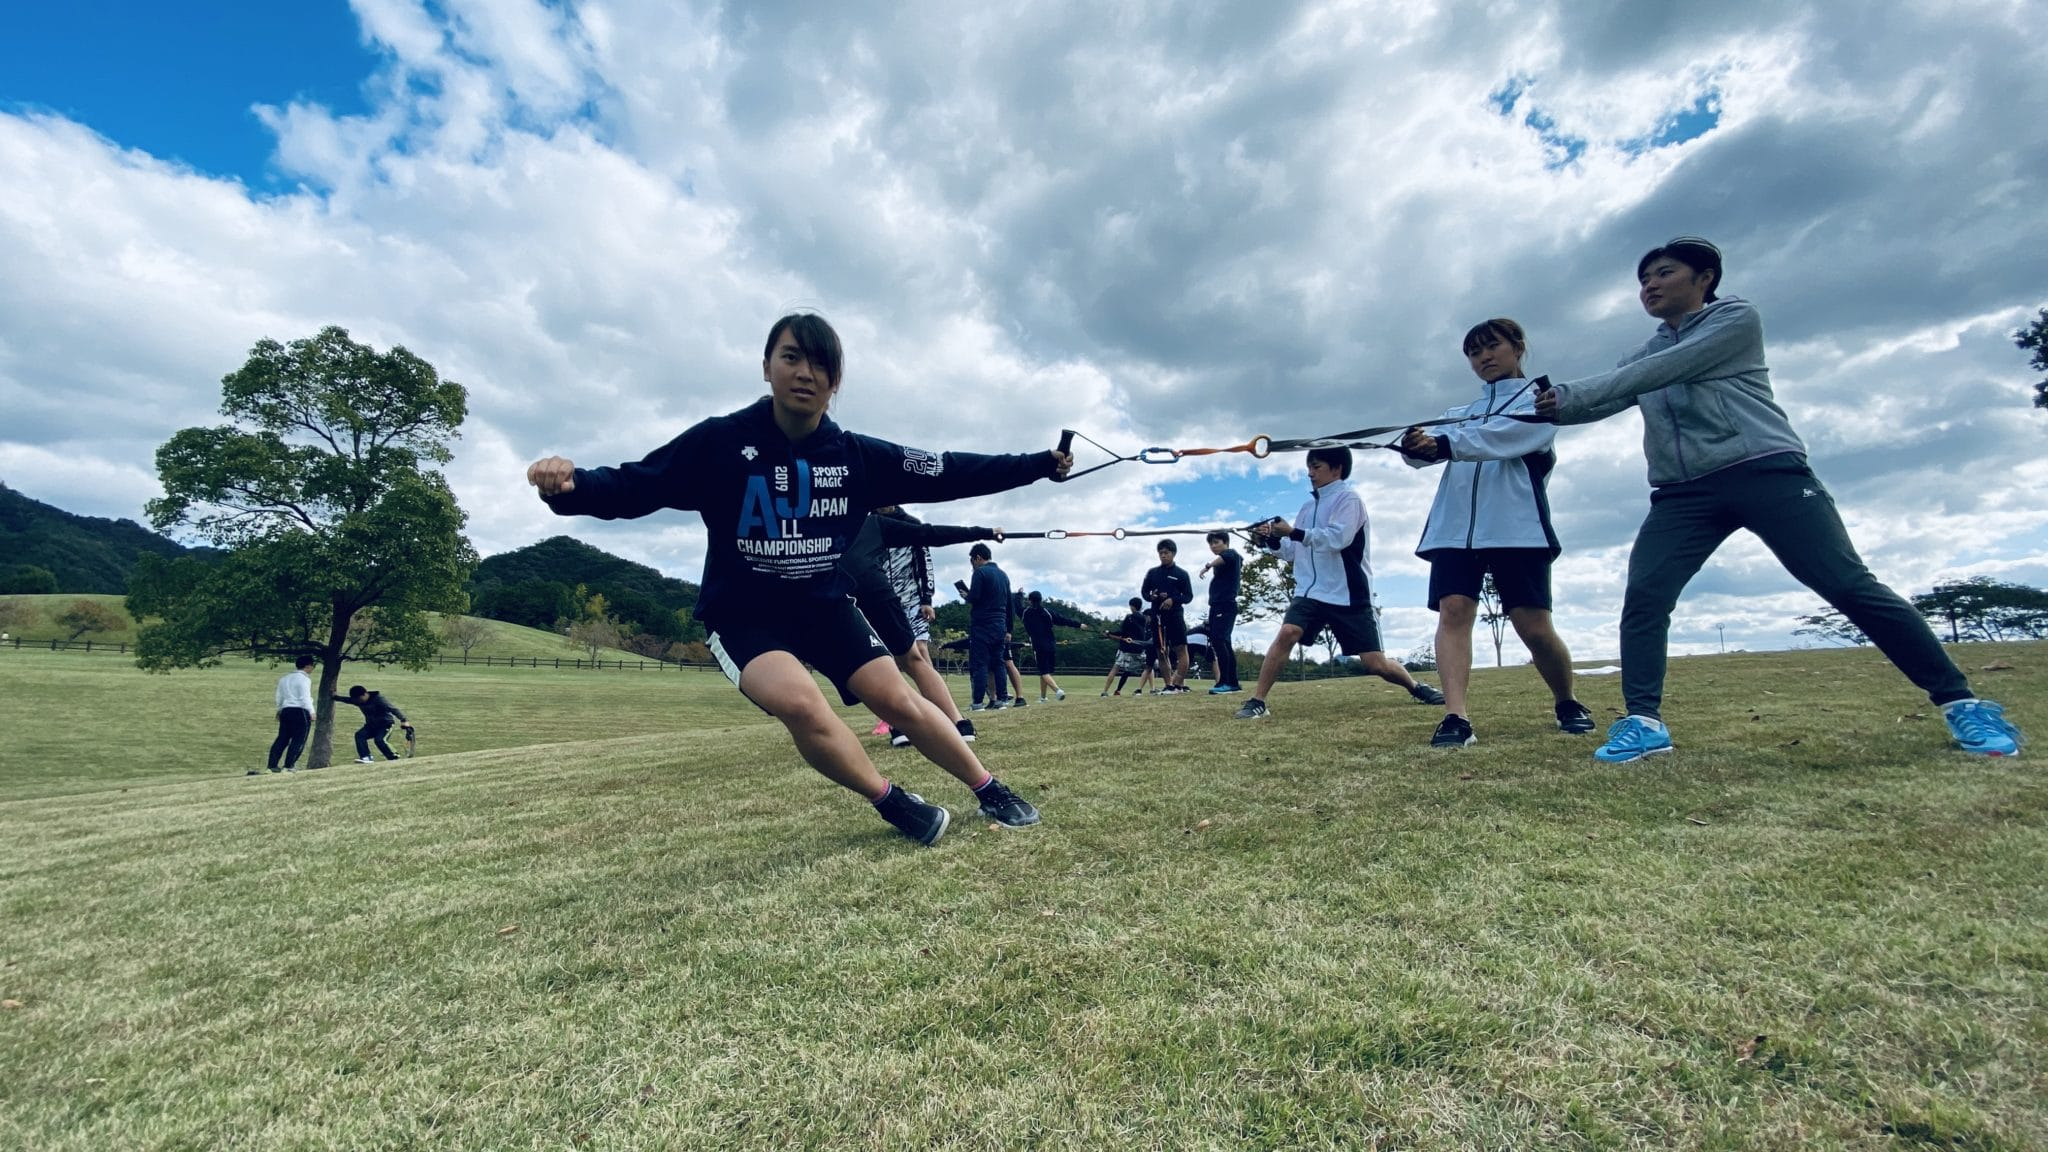 福知山成美・同志社高校・同志社女子中高スキー部・合同トレーニング